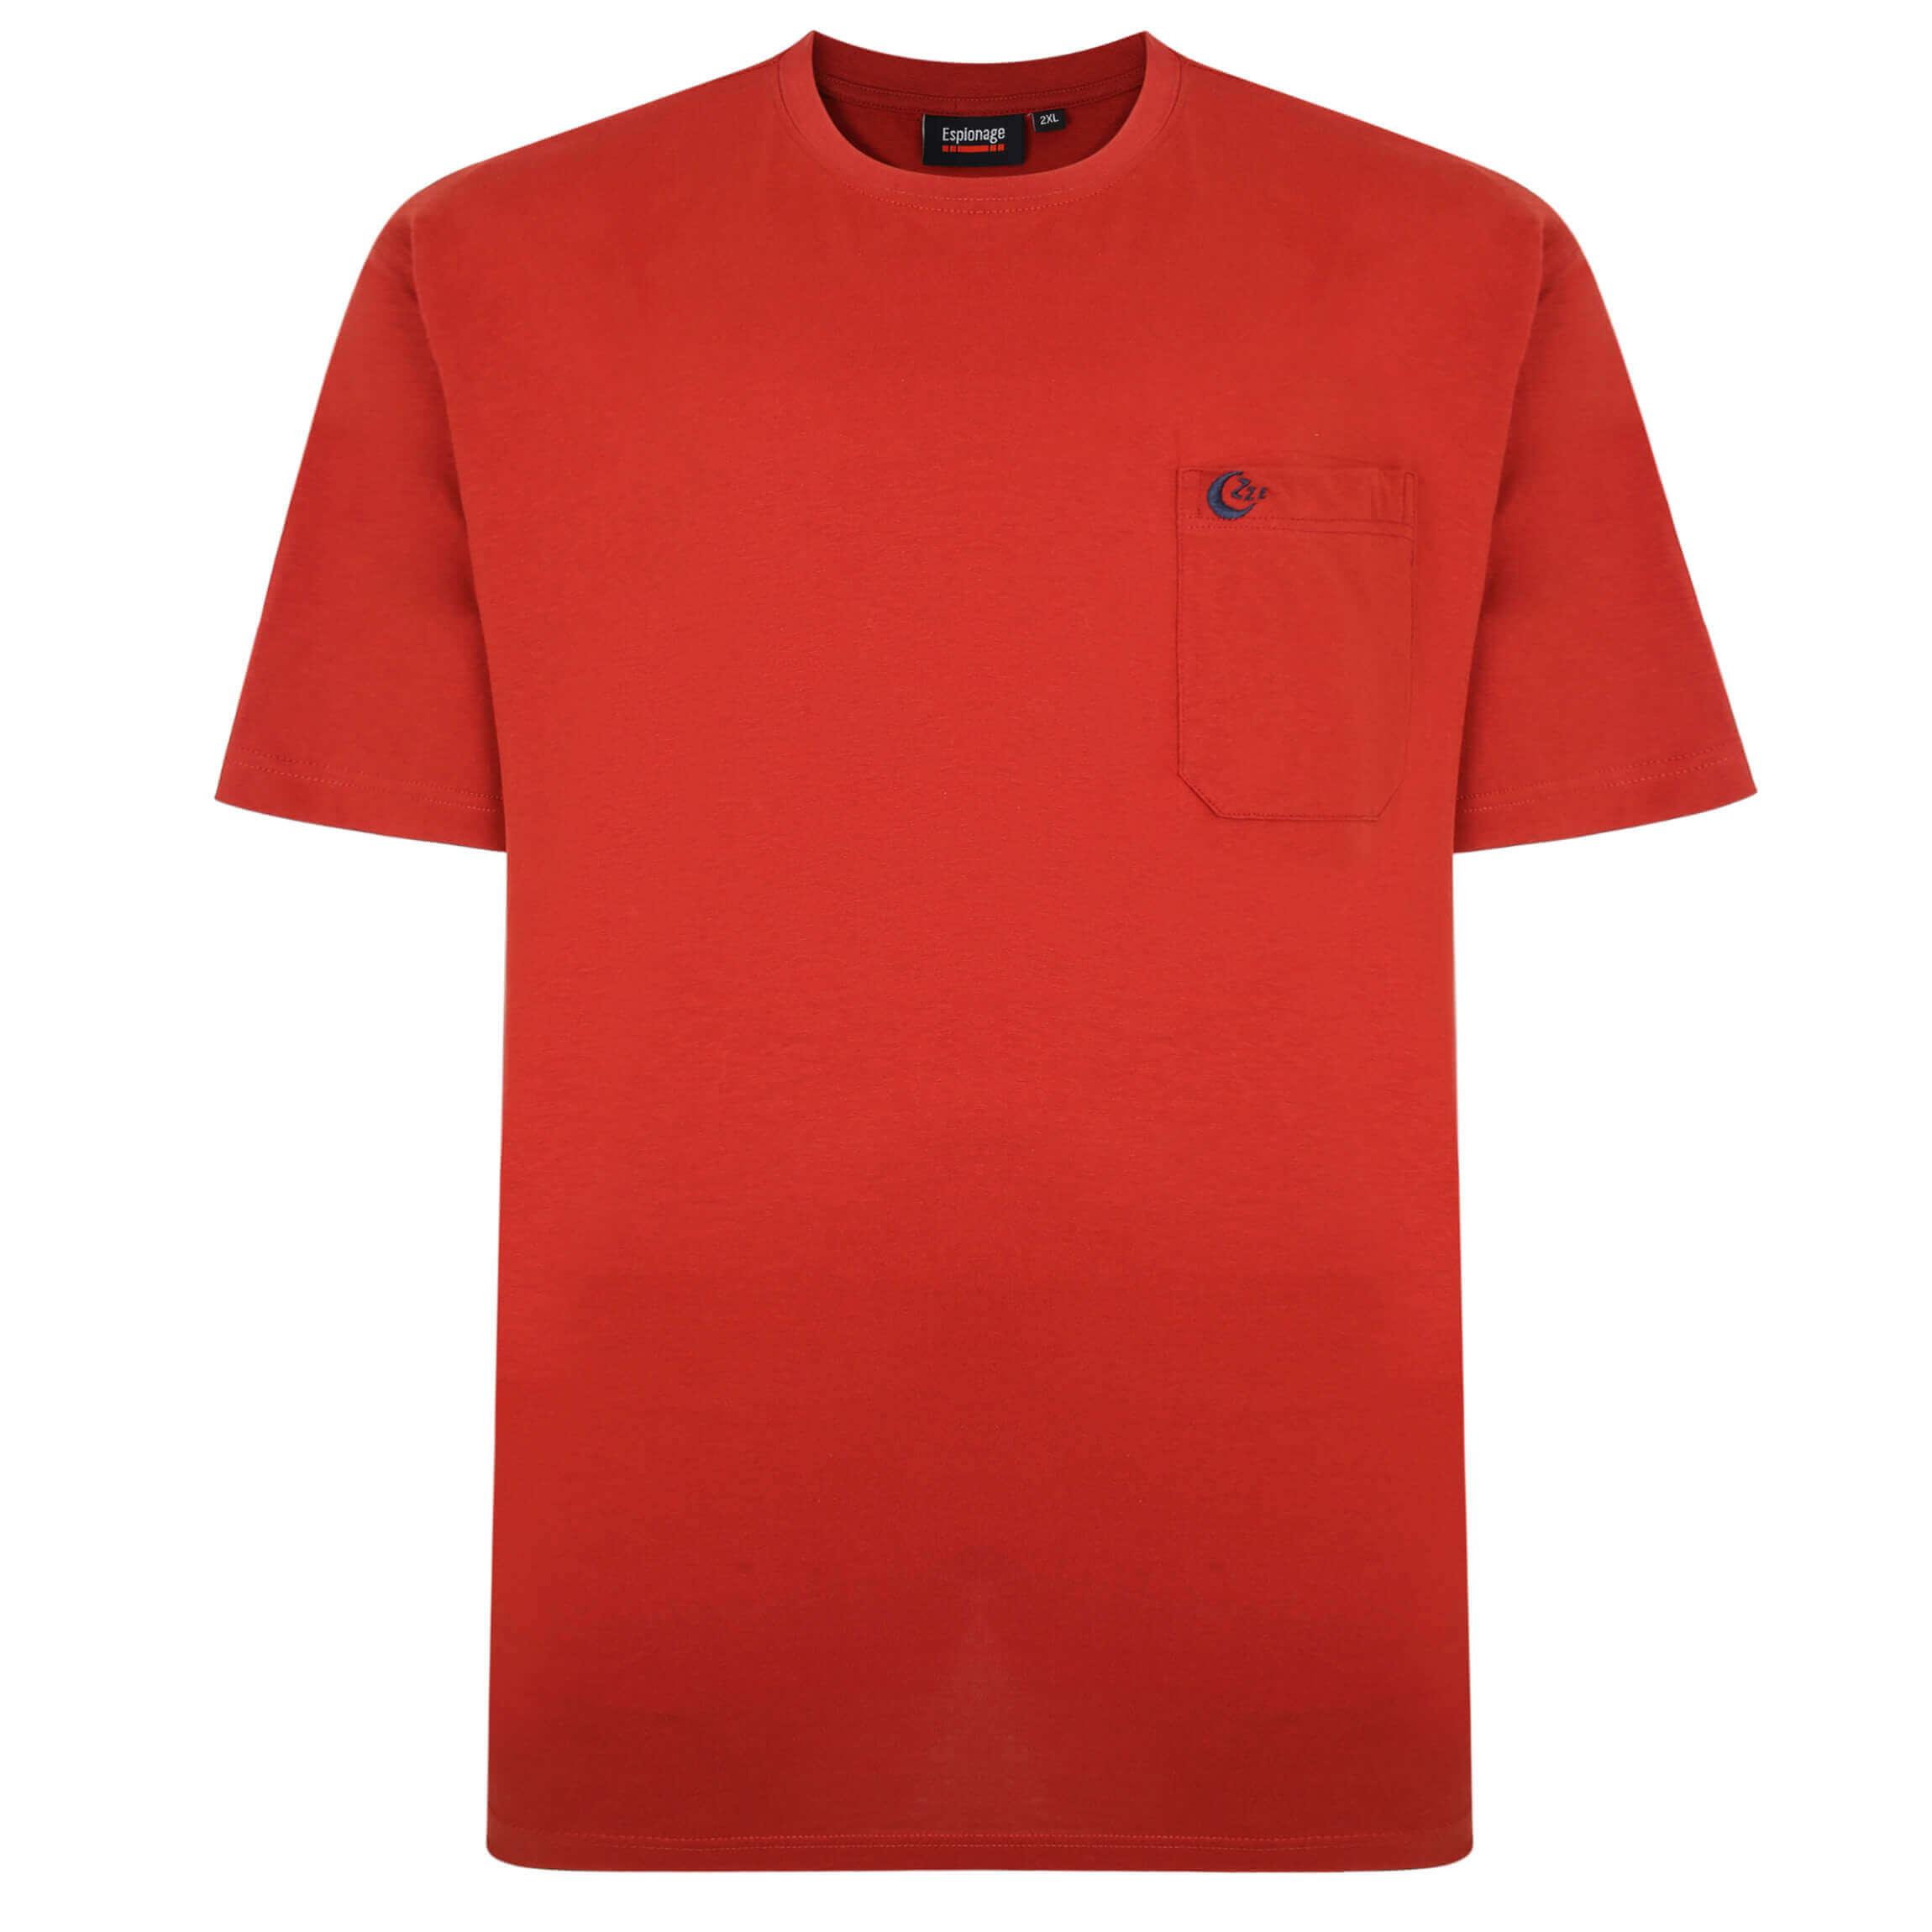 Espionage Lounge Tee Shirt